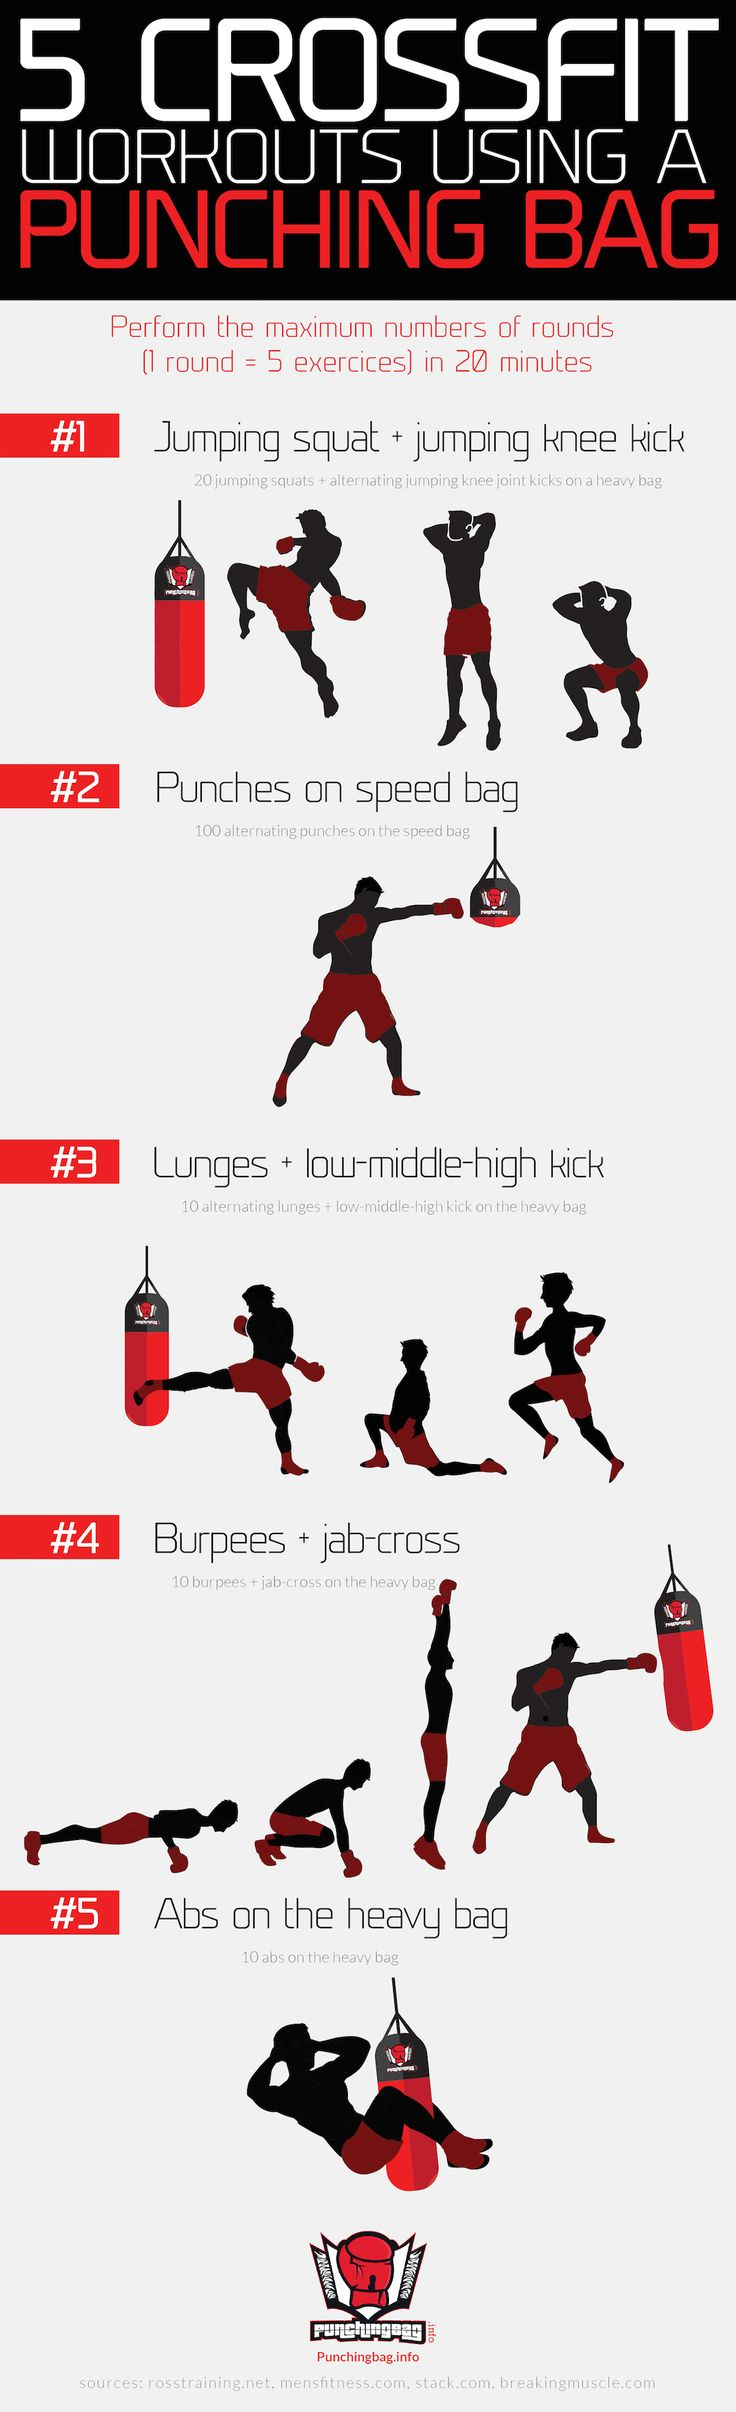 Best 25 Punching Bag Ideas On Pinterest Punching Bag